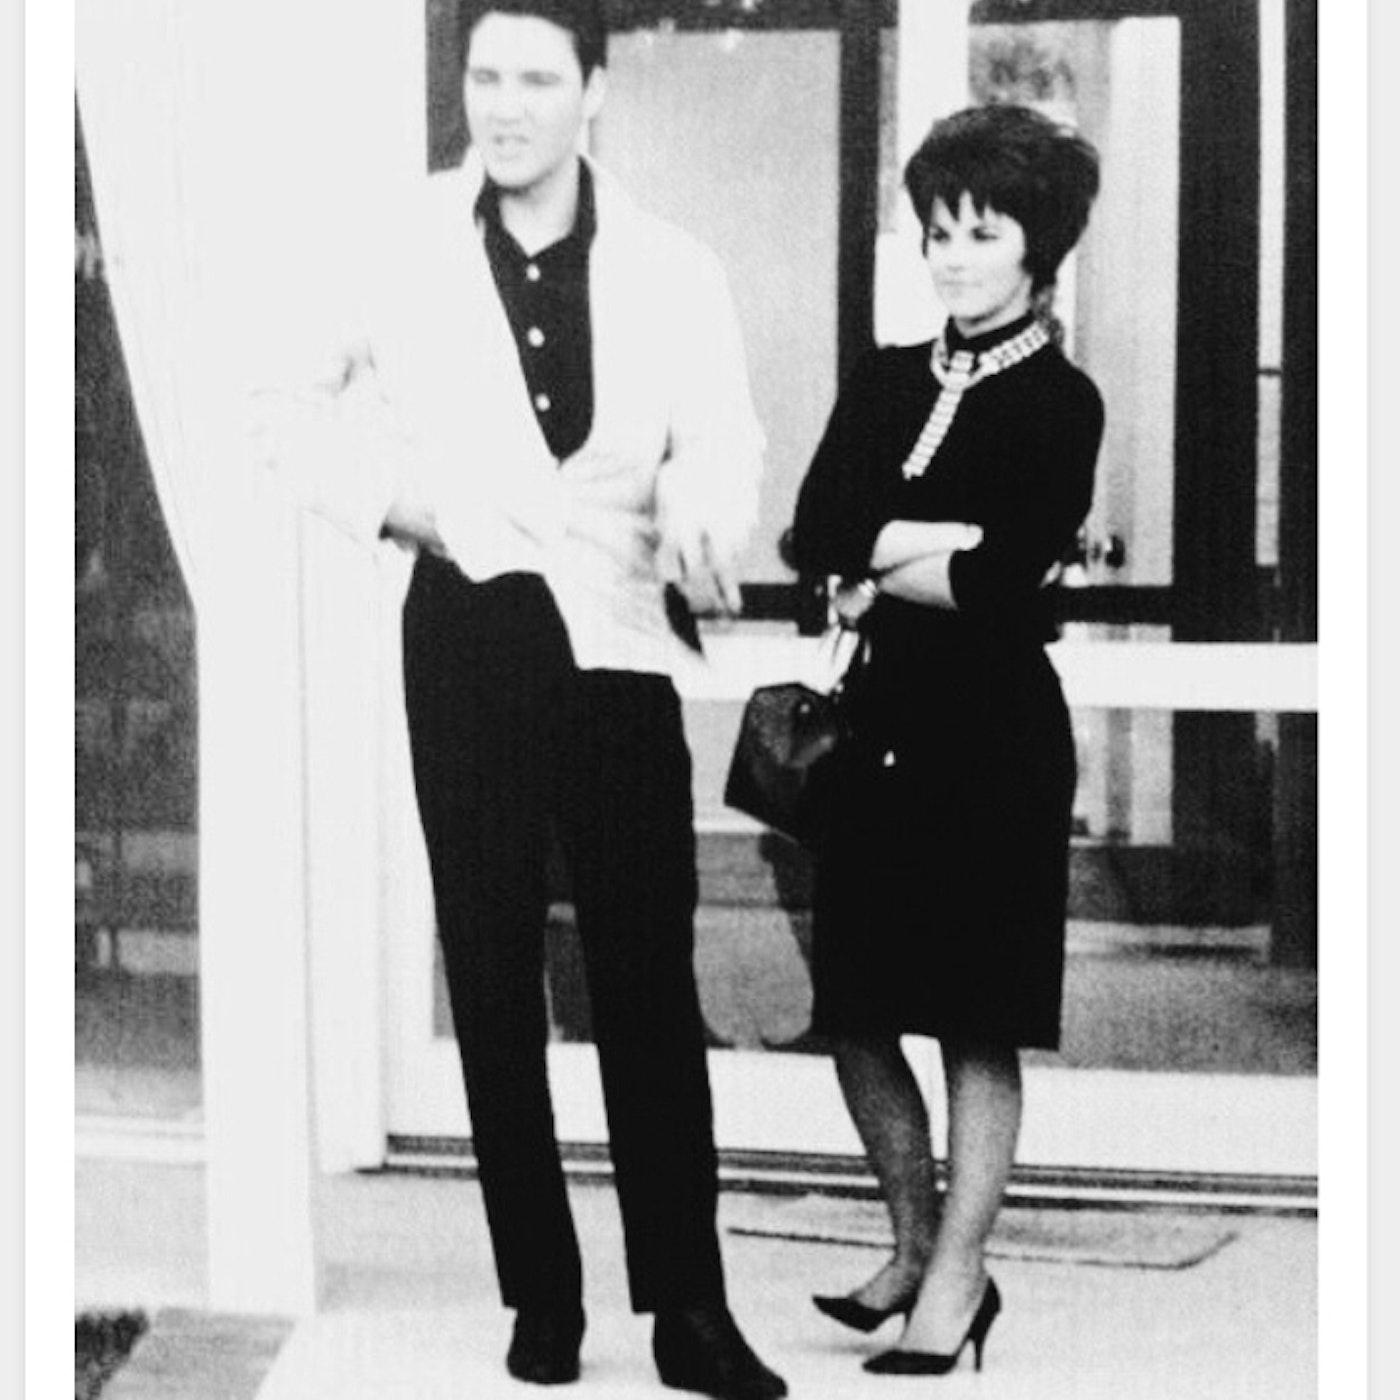 Elvis and Priscilla, Part 2 - Life goes on Priscilla ...